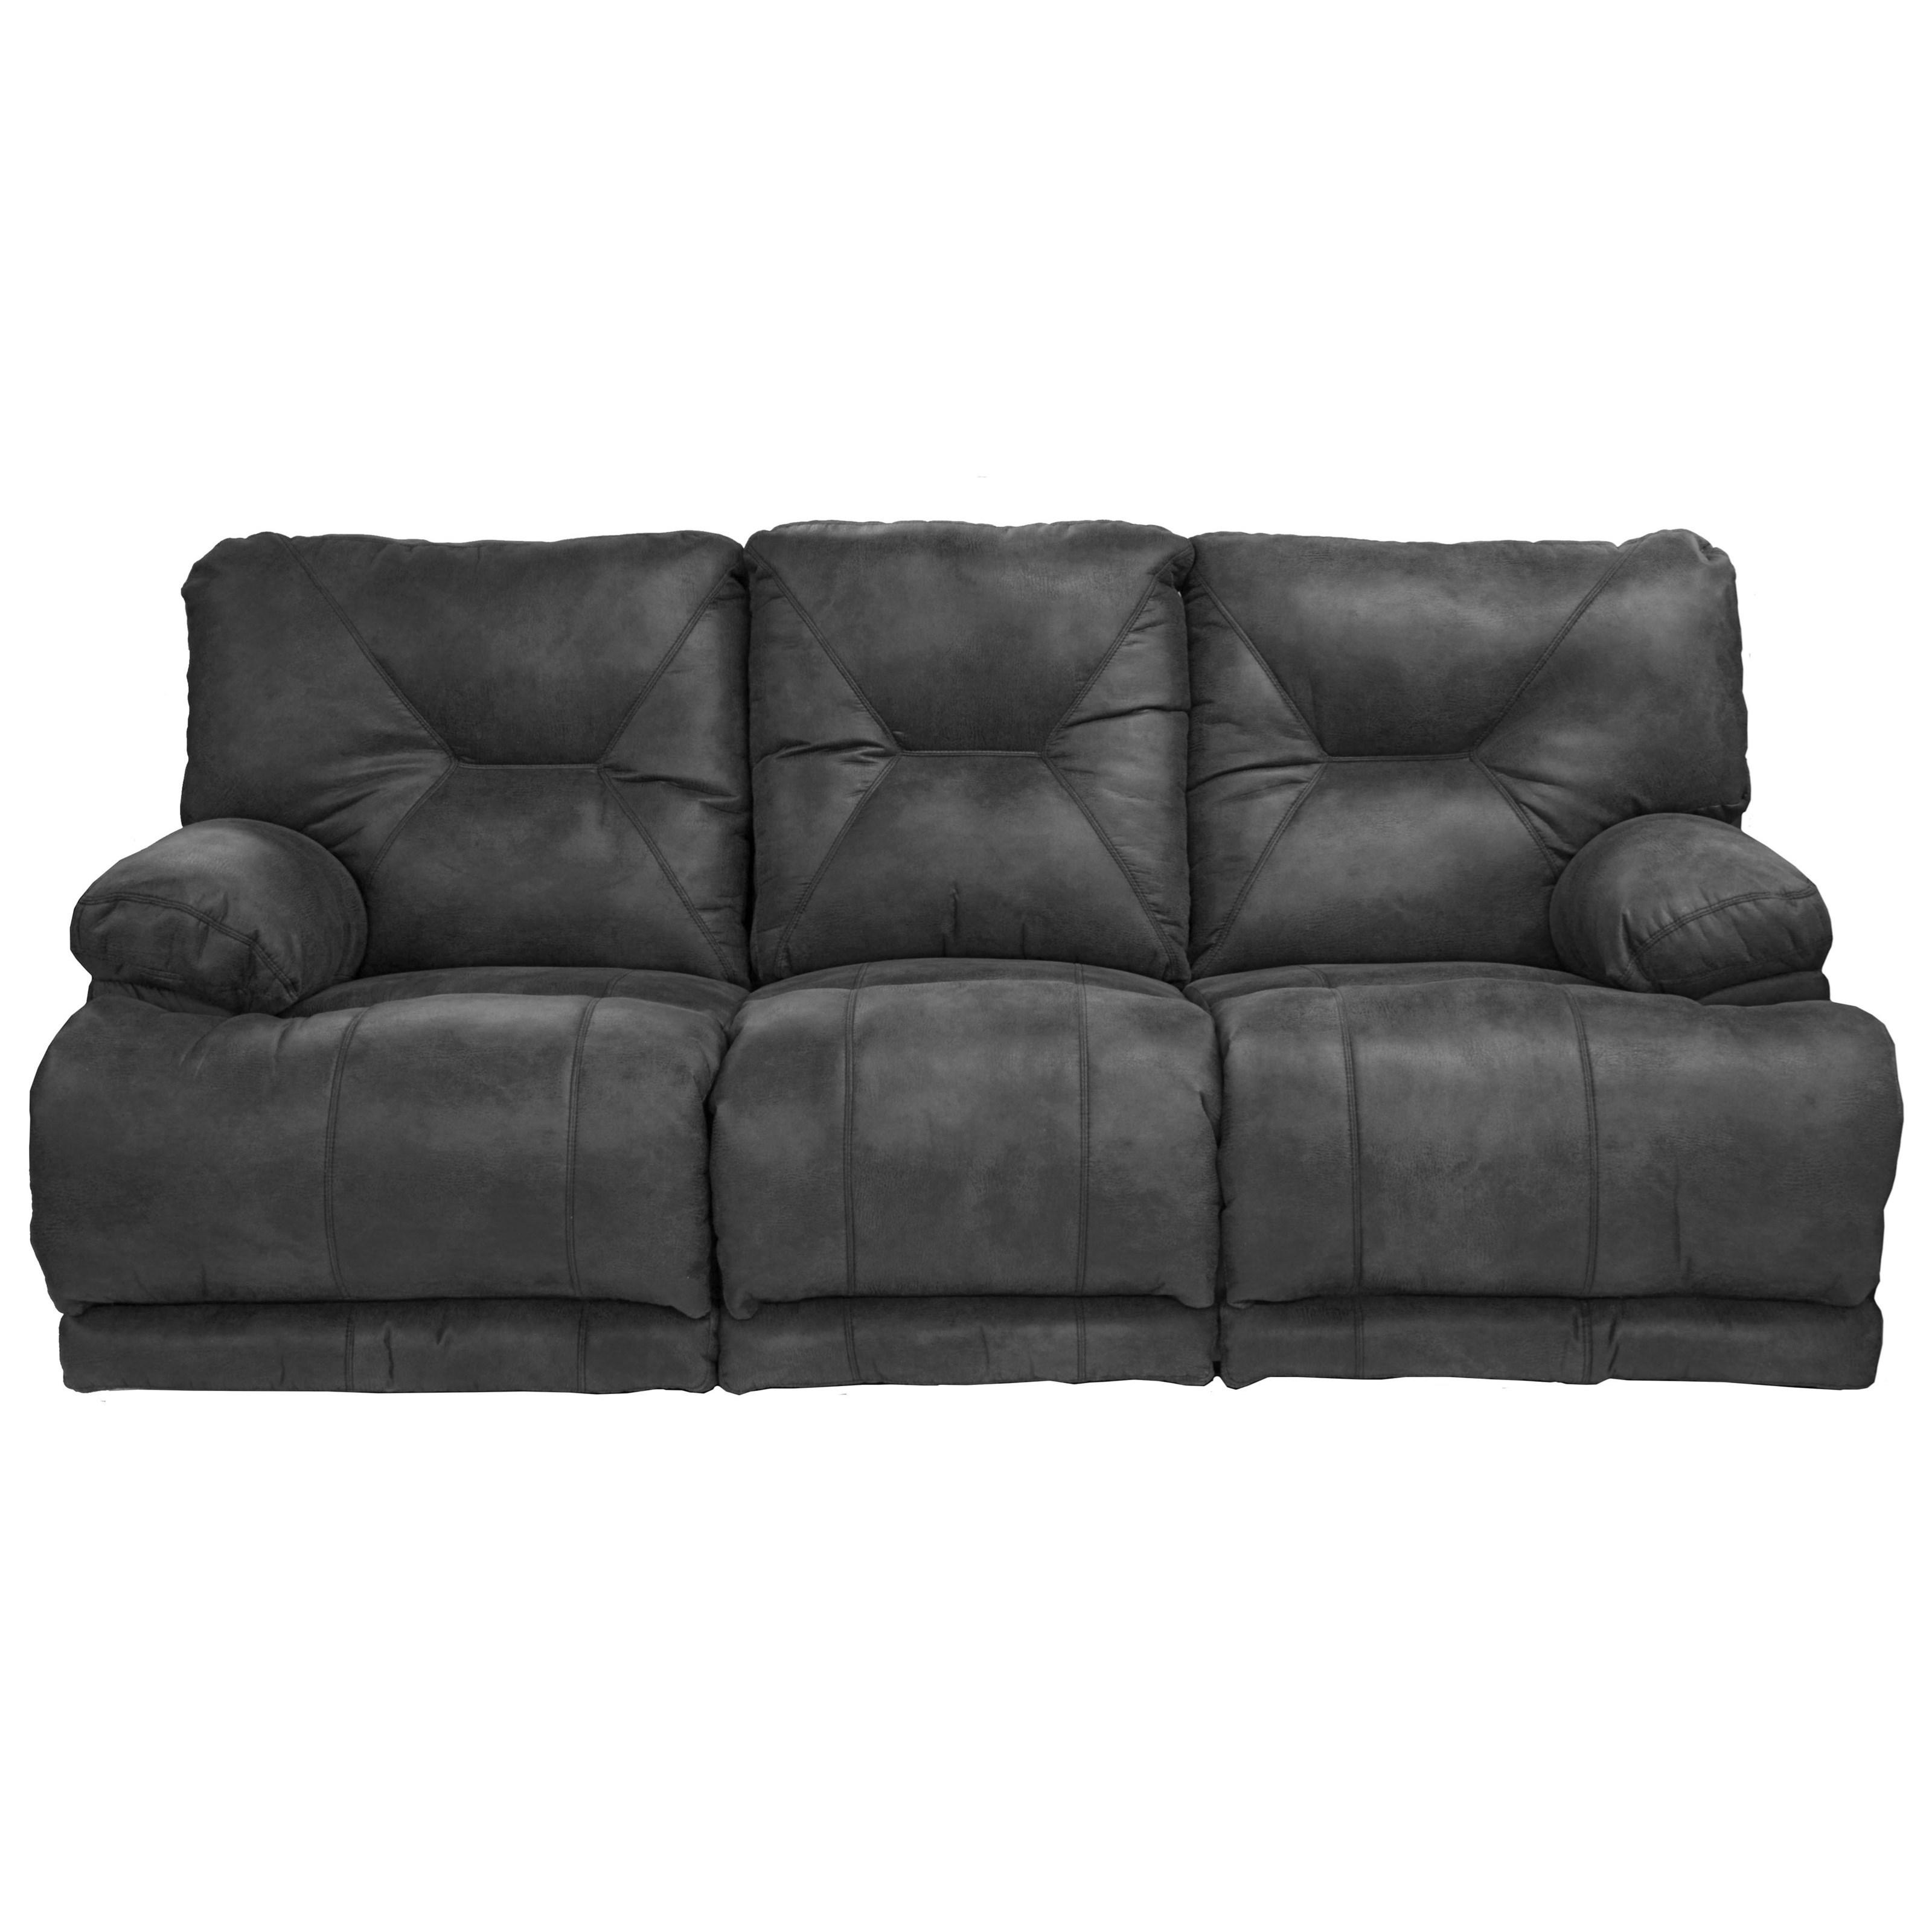 catnapper voyager power 3 seat lay flat reclining sofa